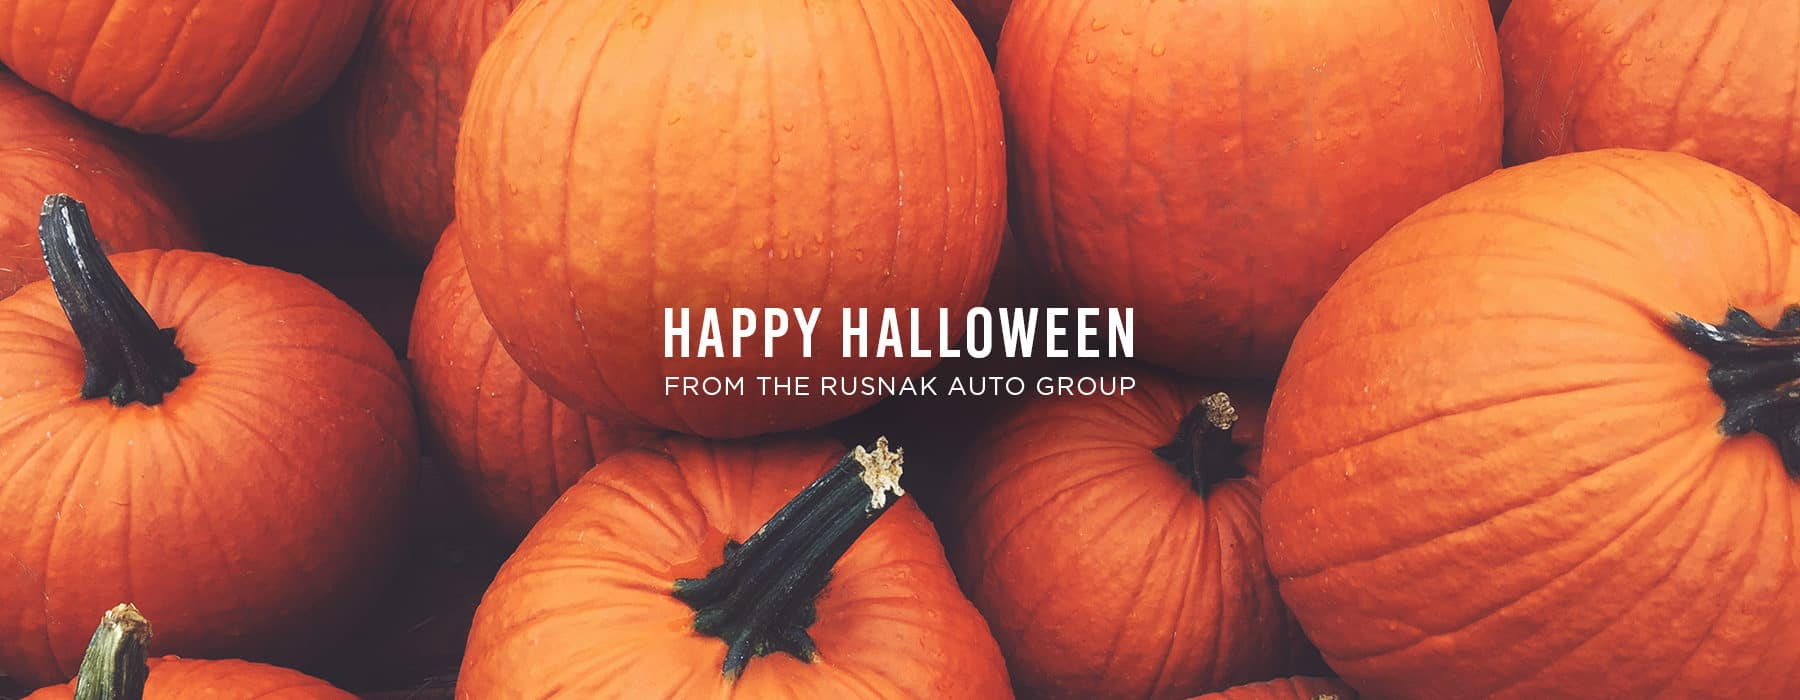 Halloween slider BE.RR.MA